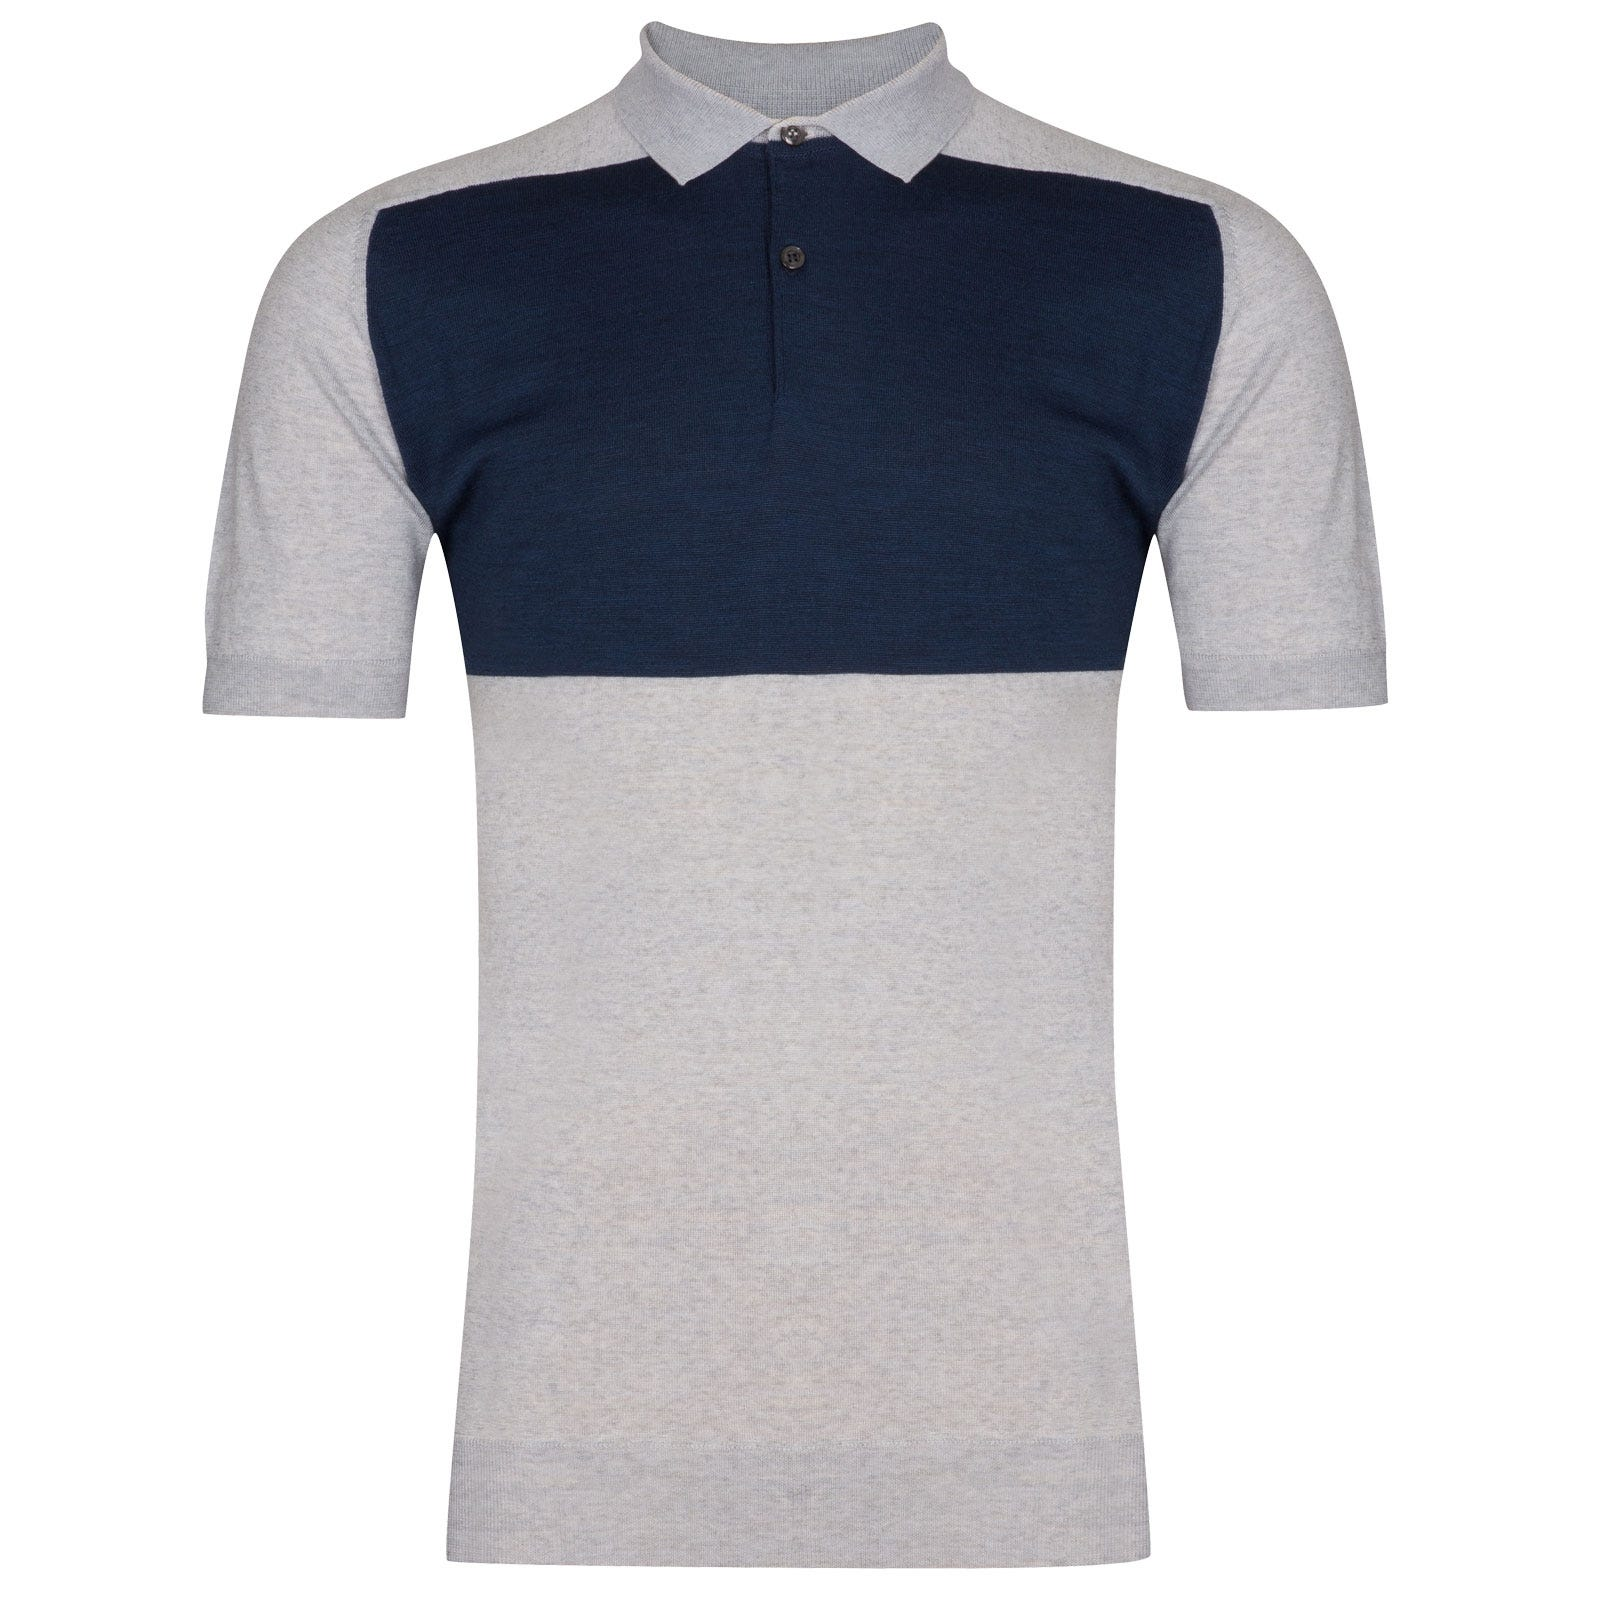 John Smedley Saba in Bardot Grey Shirt-XLG